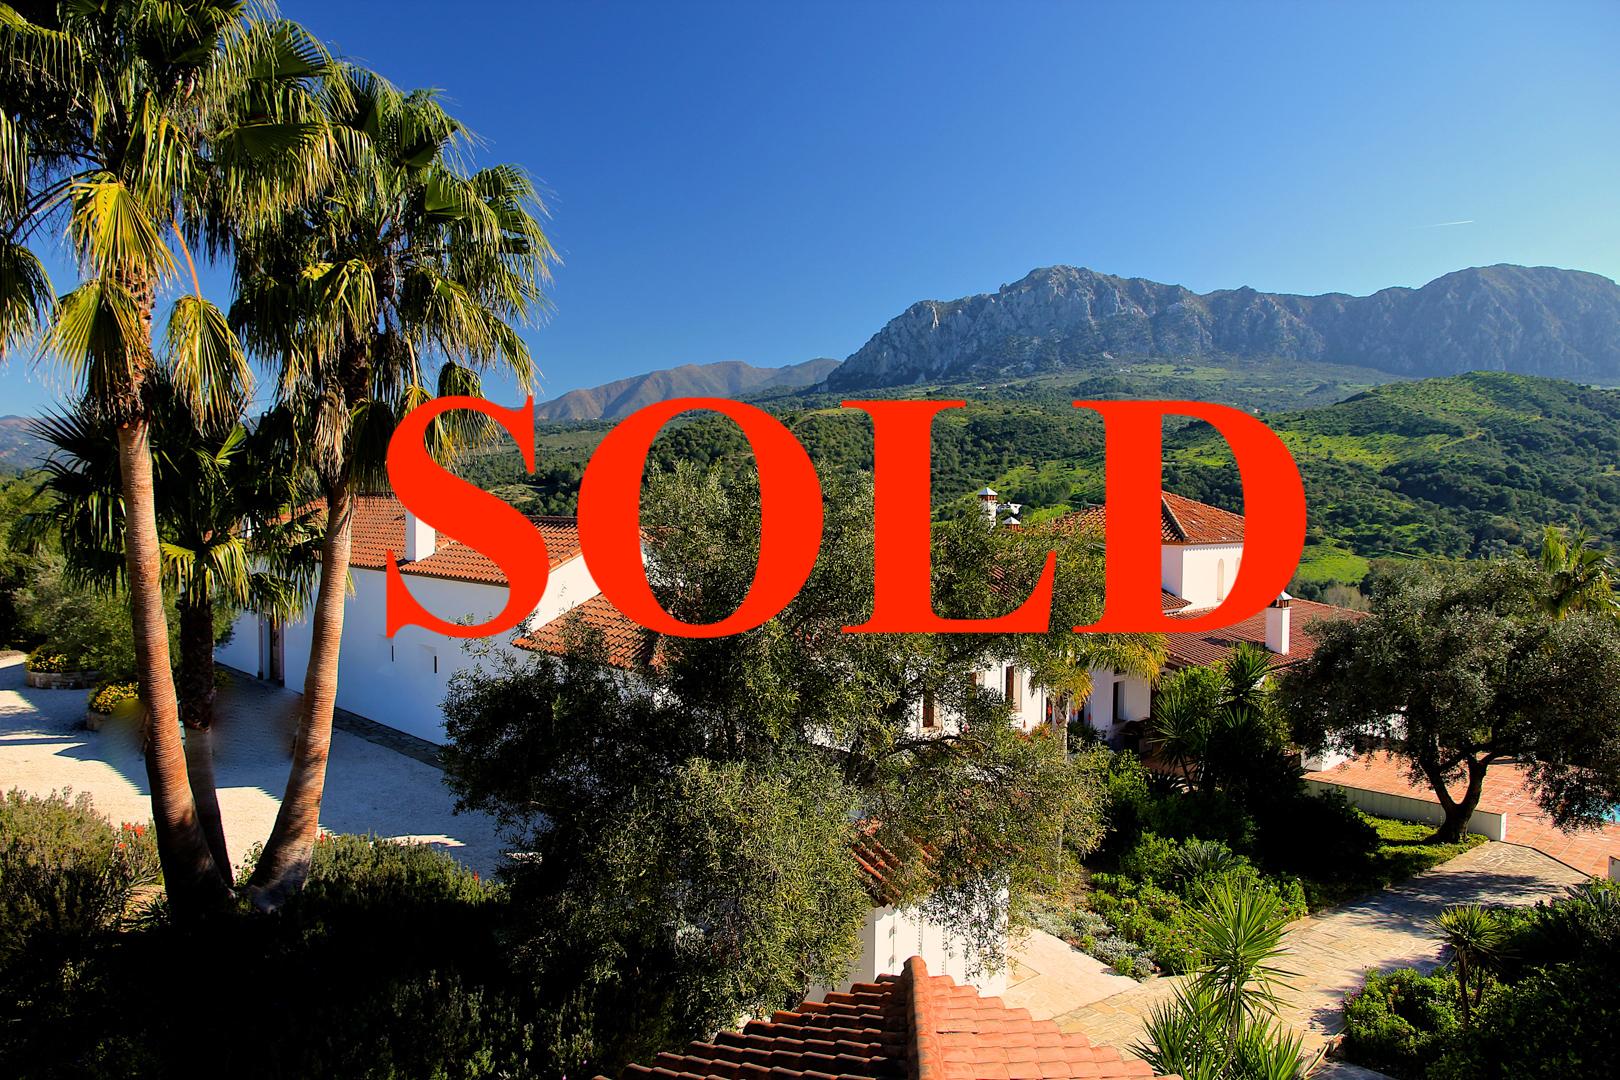 verkoop van uw woning in Andalusië